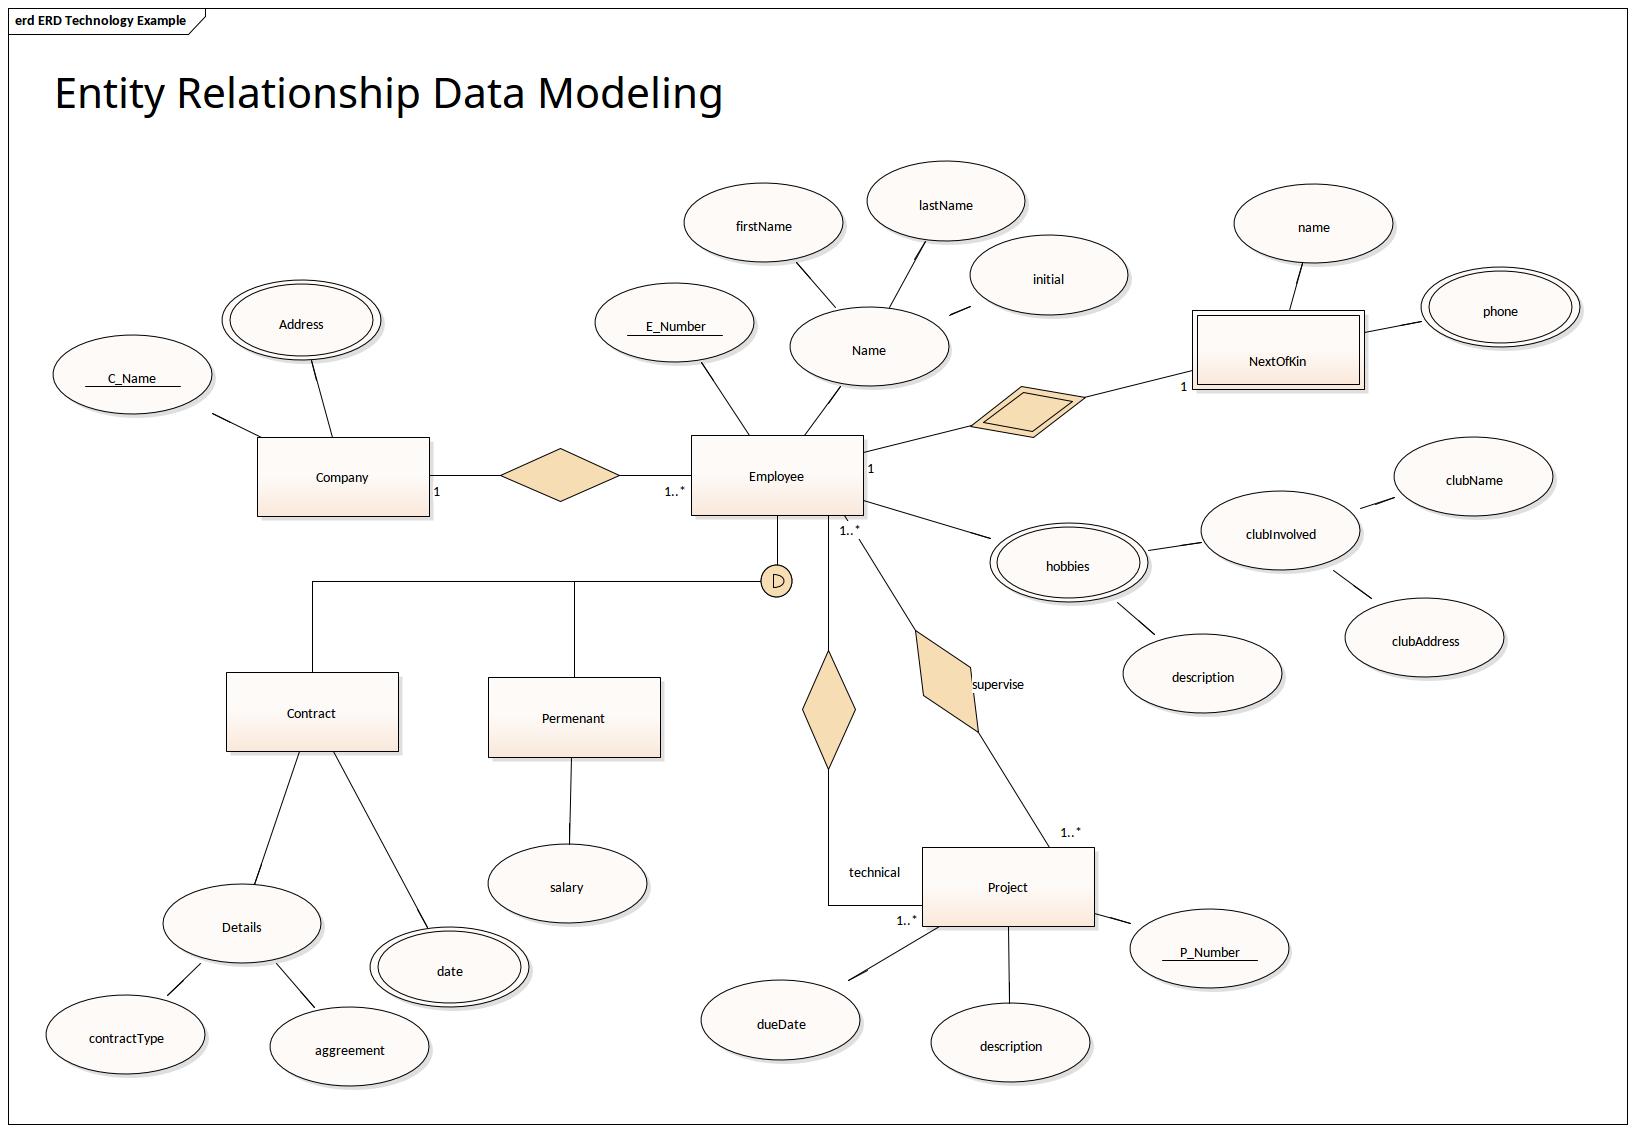 Entity Relationship Data Modeling | Enterprise Architect with regard to Entity Model Diagram